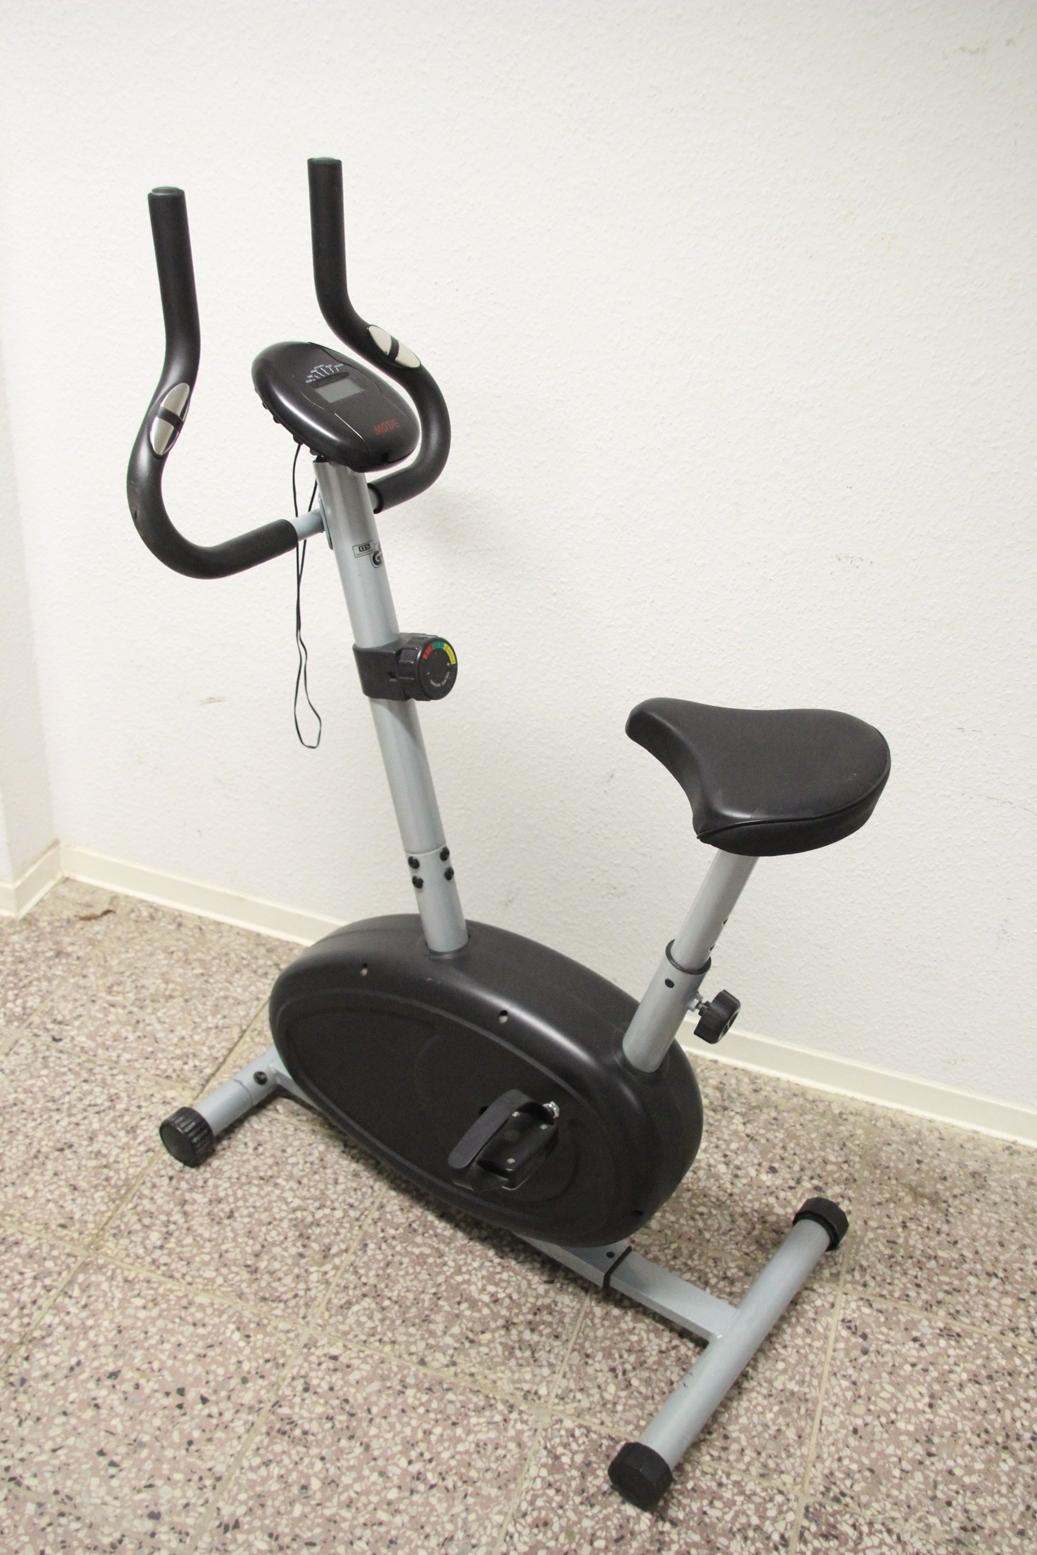 mode magnetic light heimtrainer ergometer fahrradtrainer. Black Bedroom Furniture Sets. Home Design Ideas